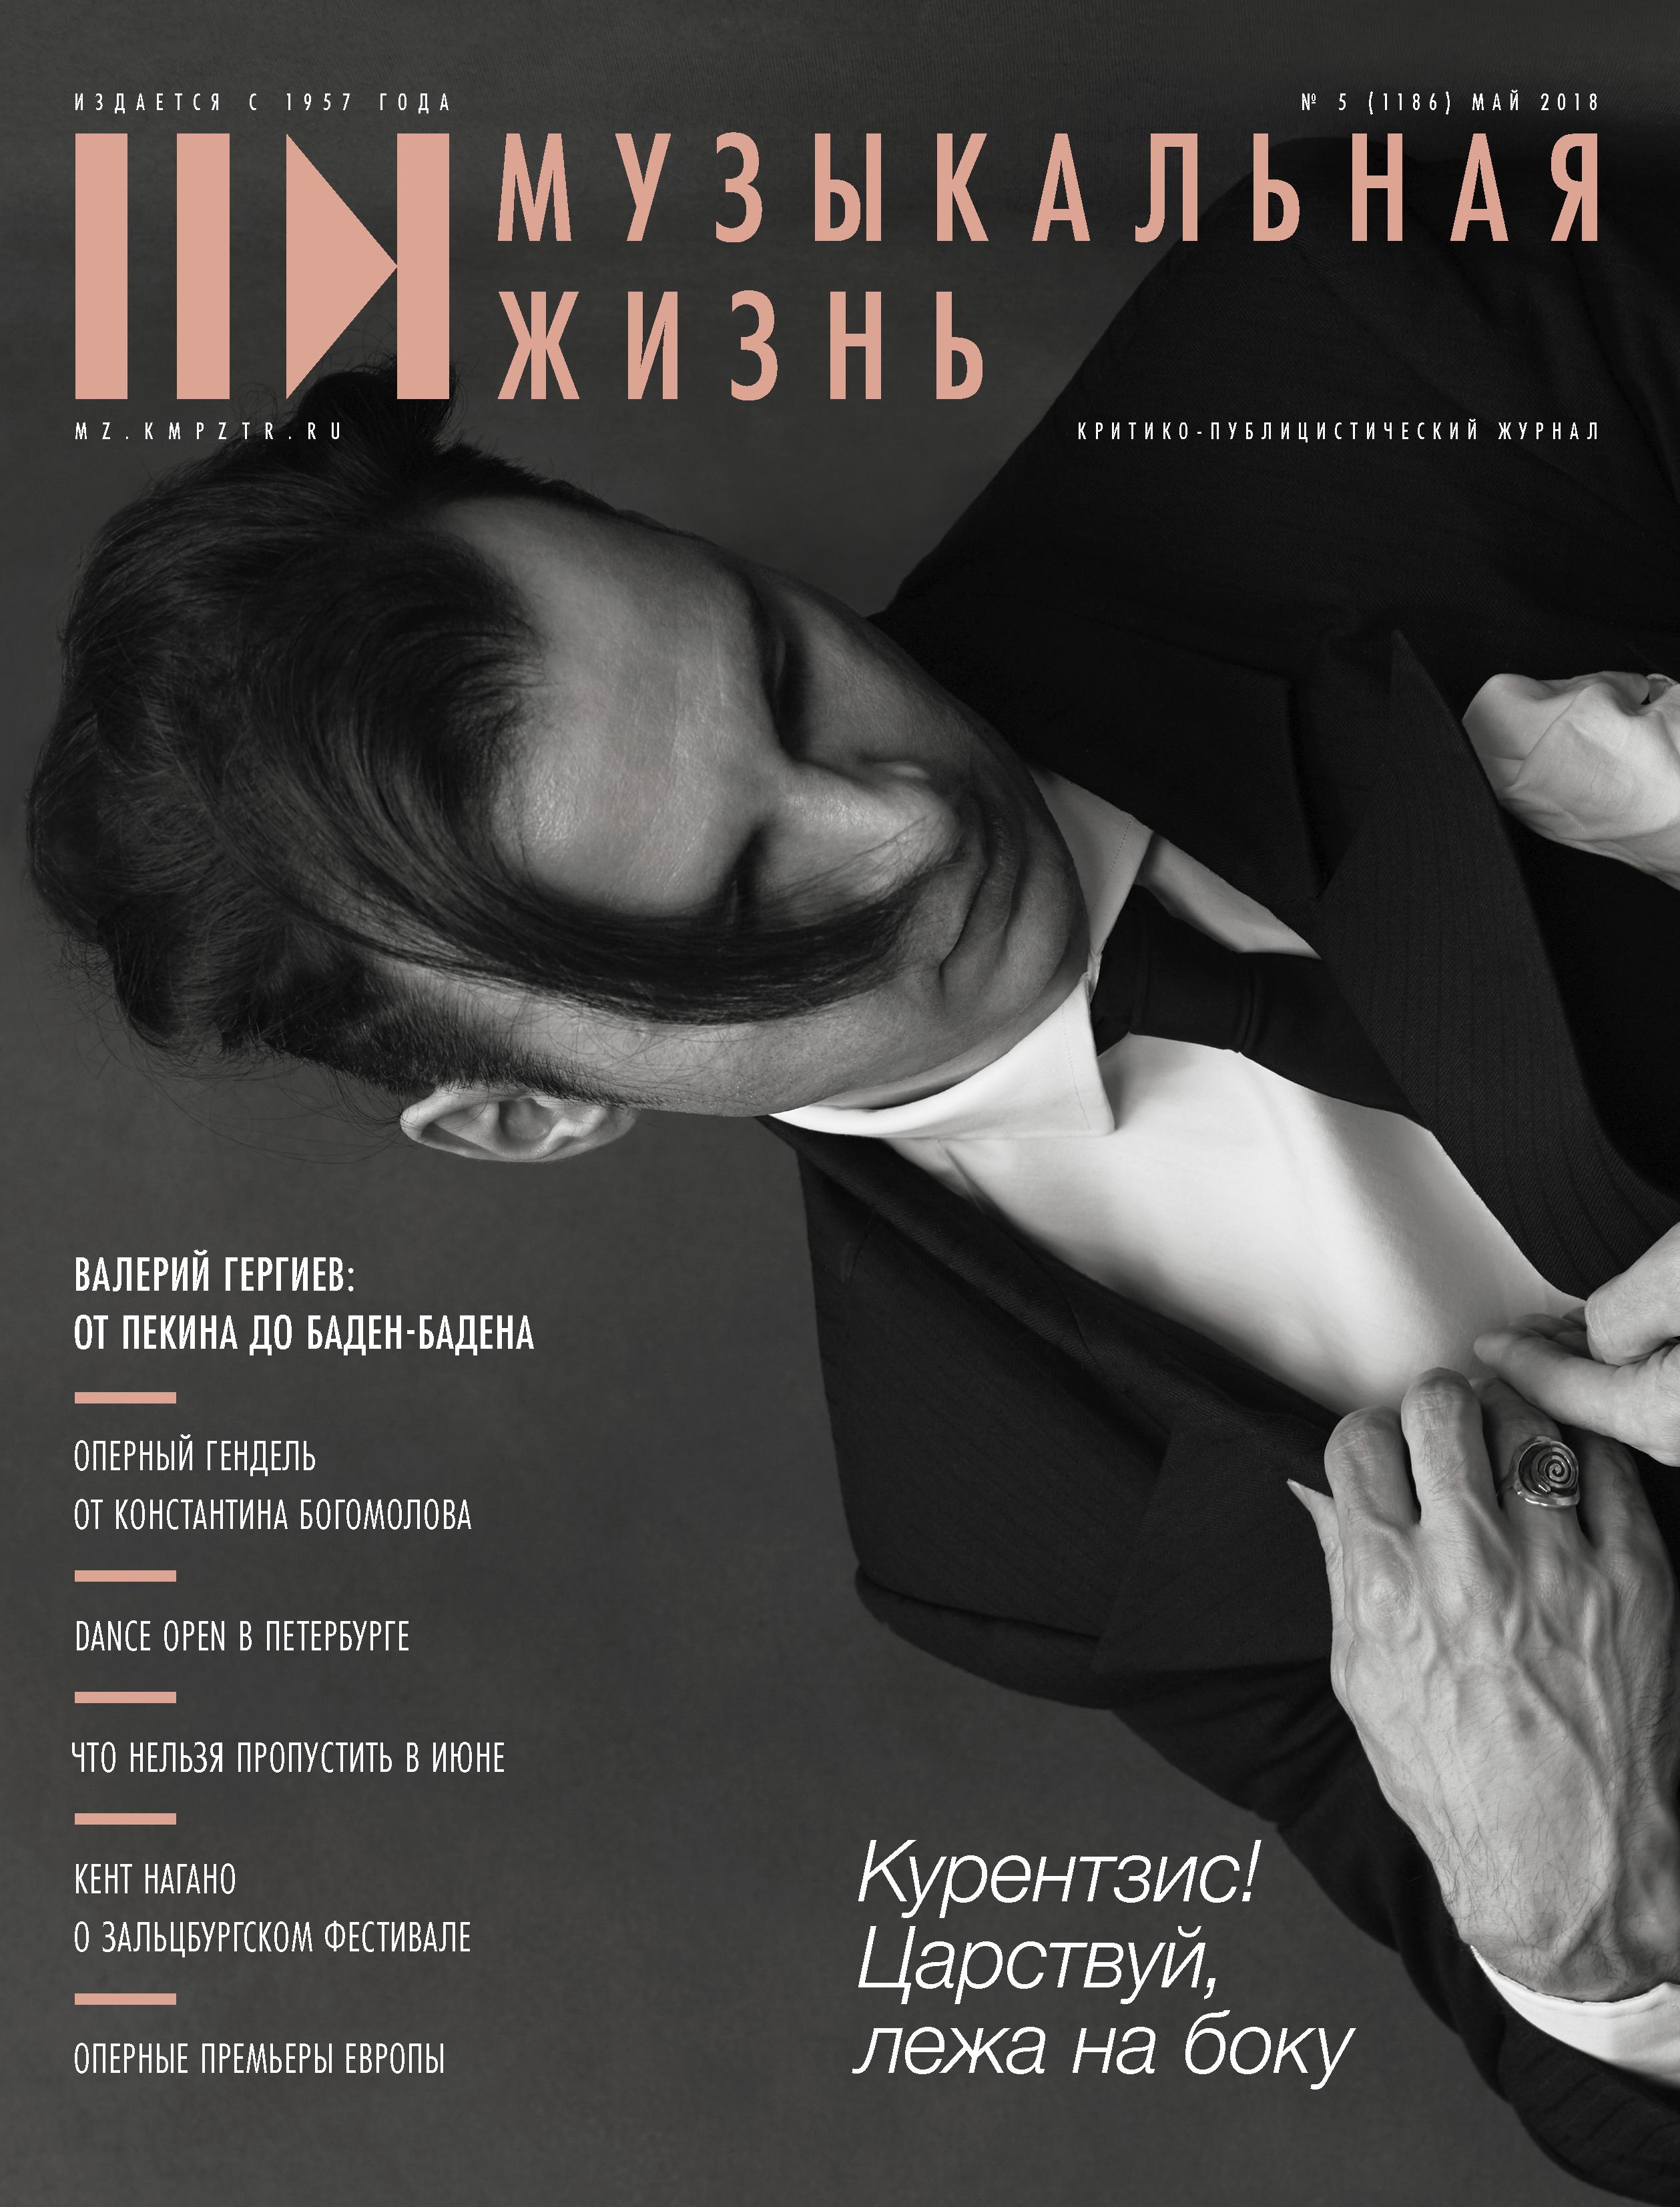 Музыкальная жизнь №5, 2018